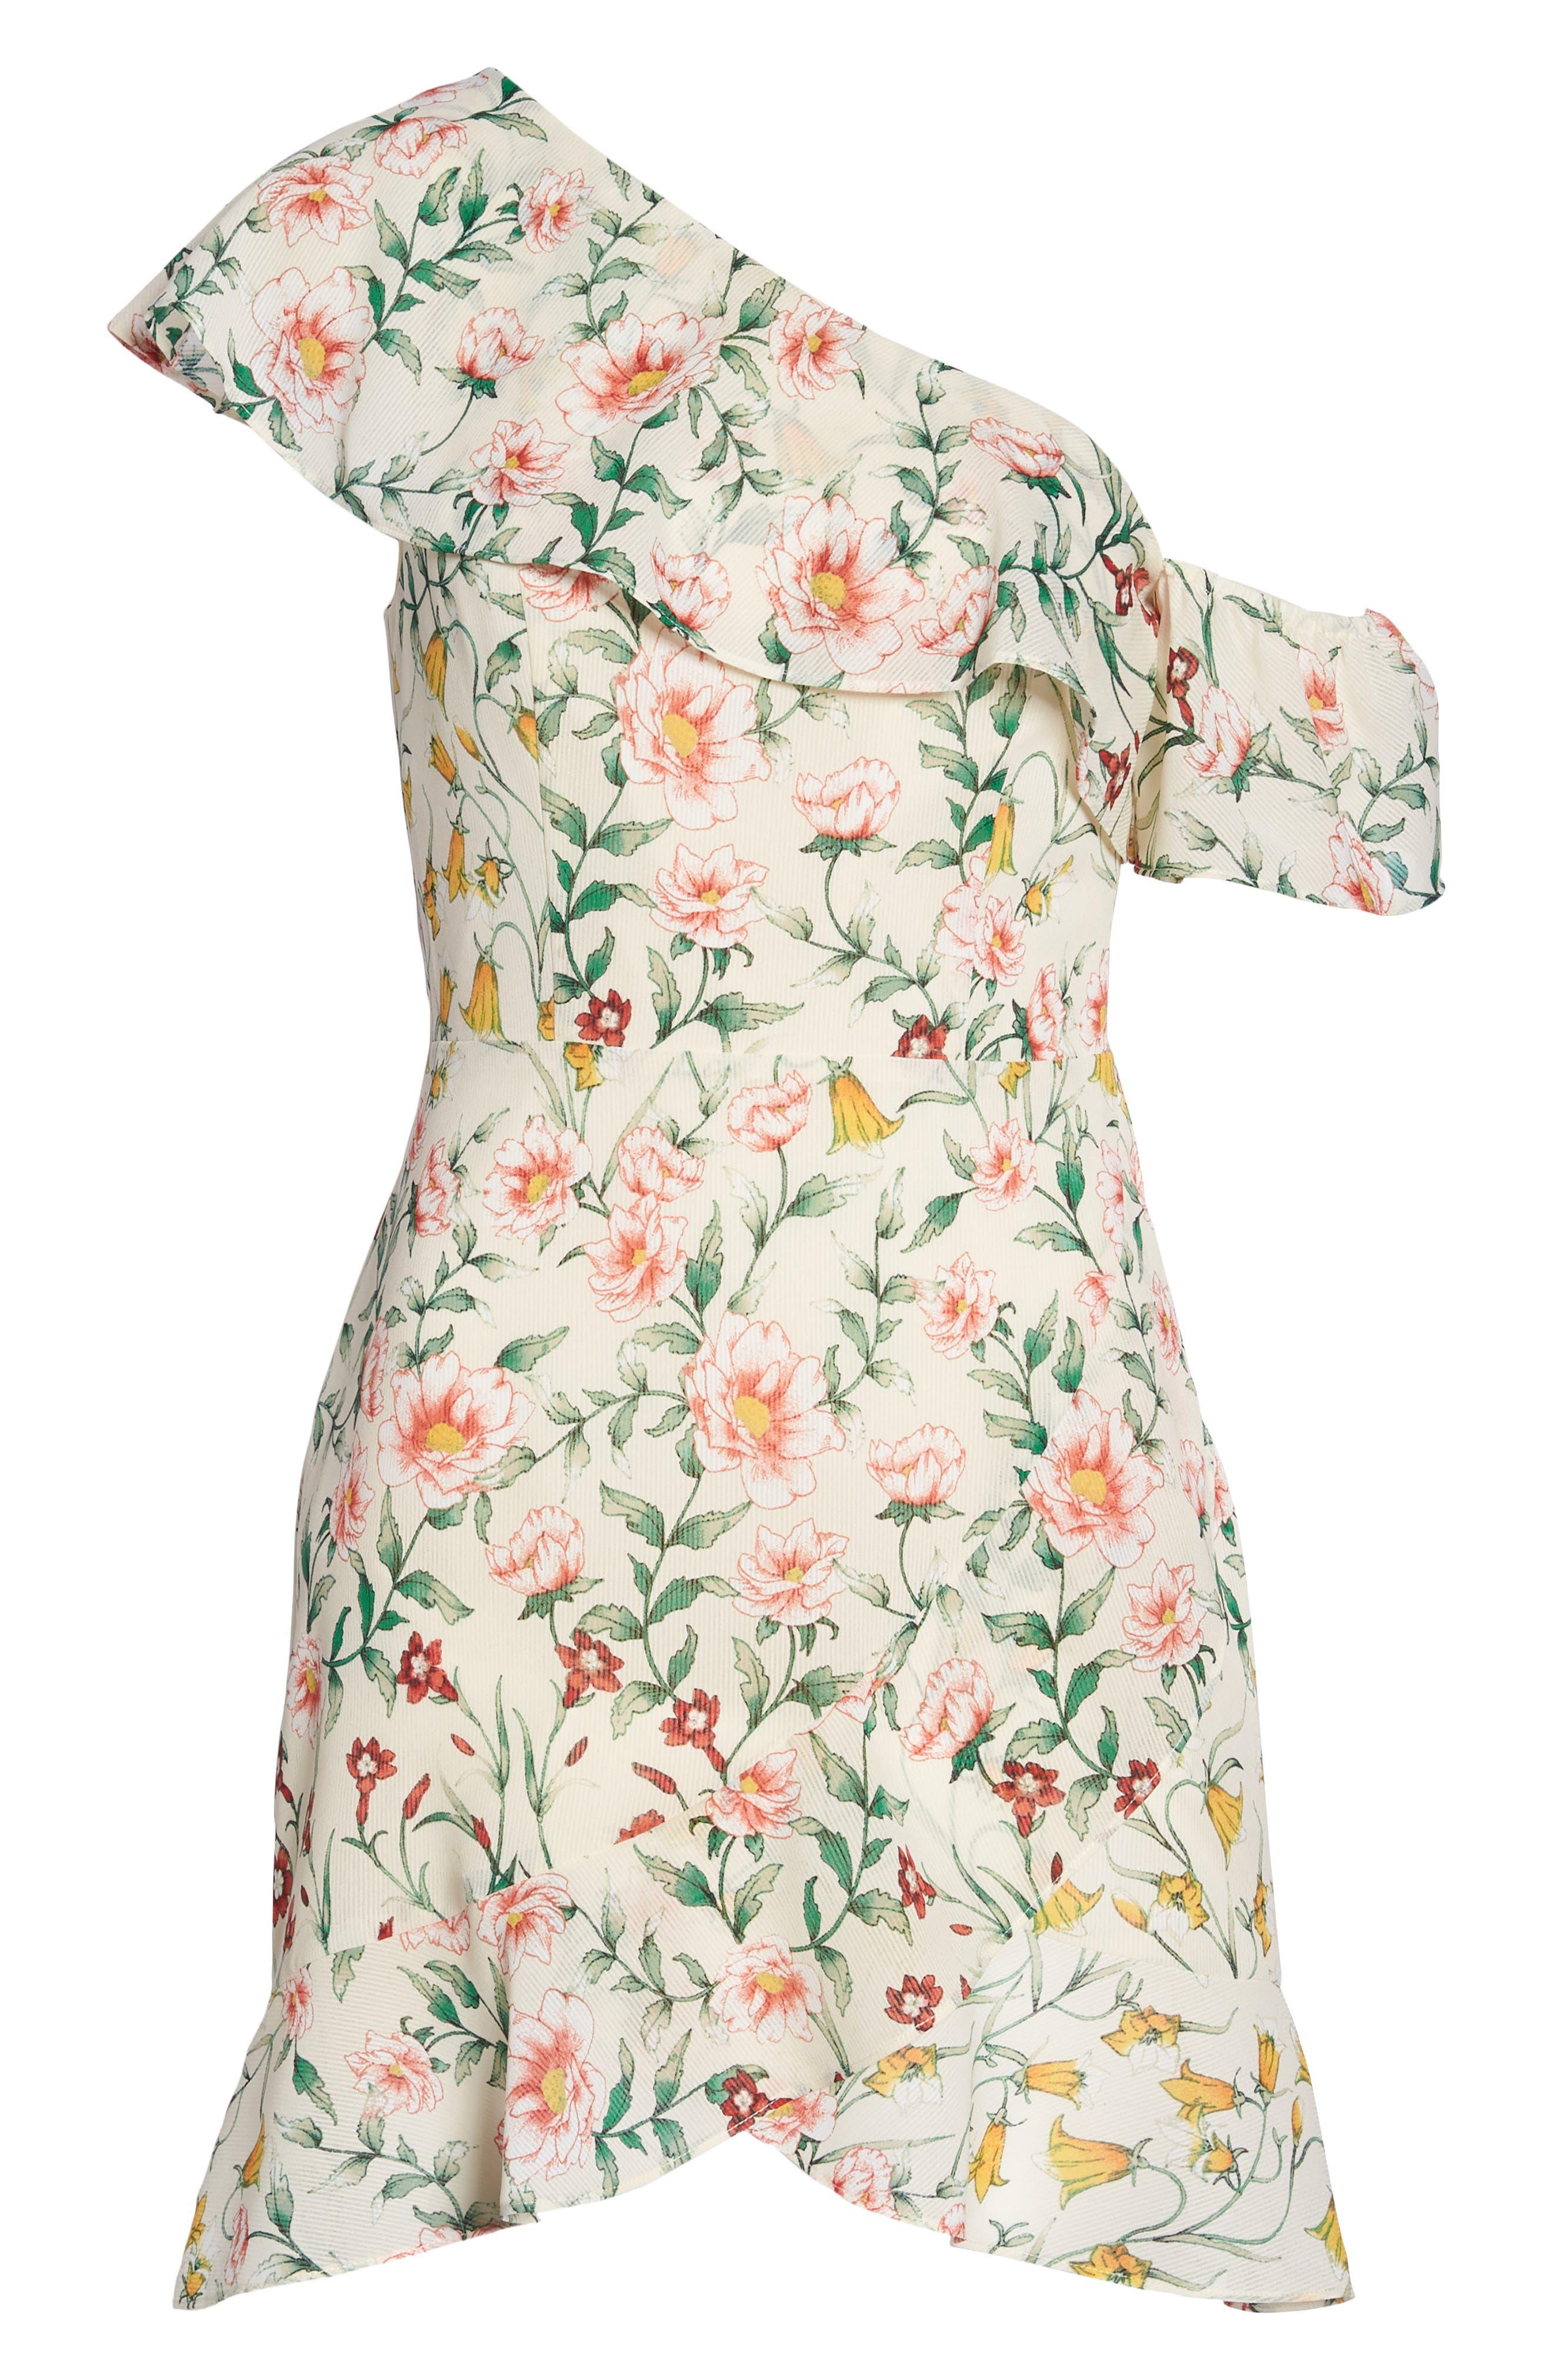 ALI & JAY,                             Zinque Afternoons One-Shoulder Dress,                             Alternate thumbnail 7, color,                             655